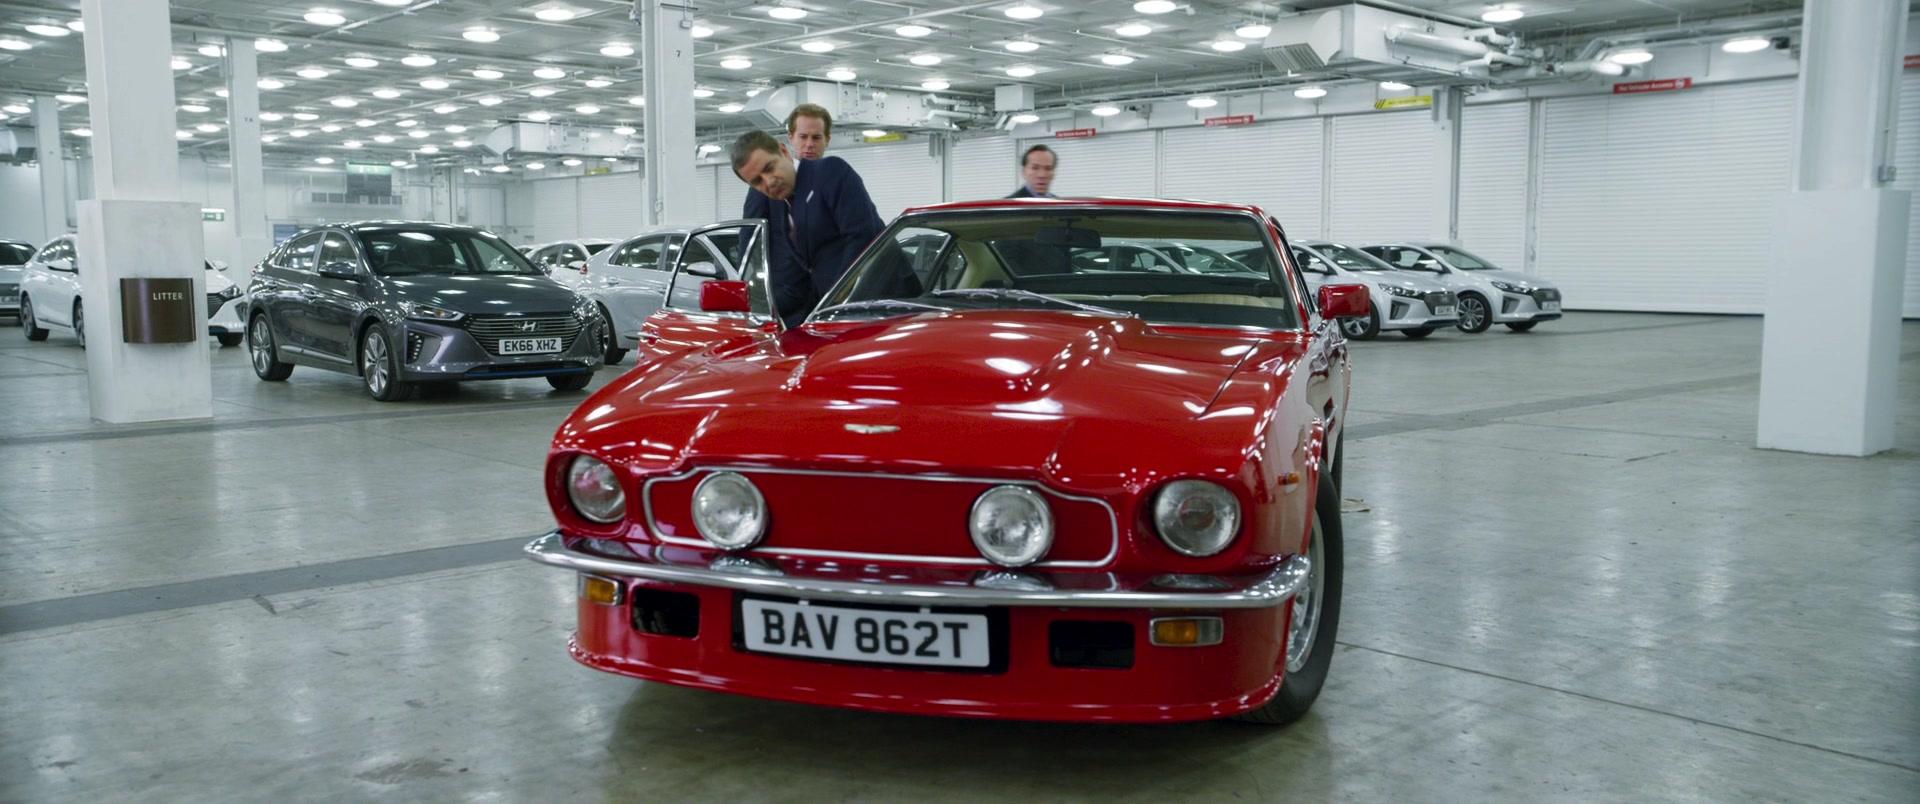 Exotic Car Brands >> 1979 Aston Martin V8 Vantage MkI Sports Car in Johnny English Strikes Again (2018) Movie